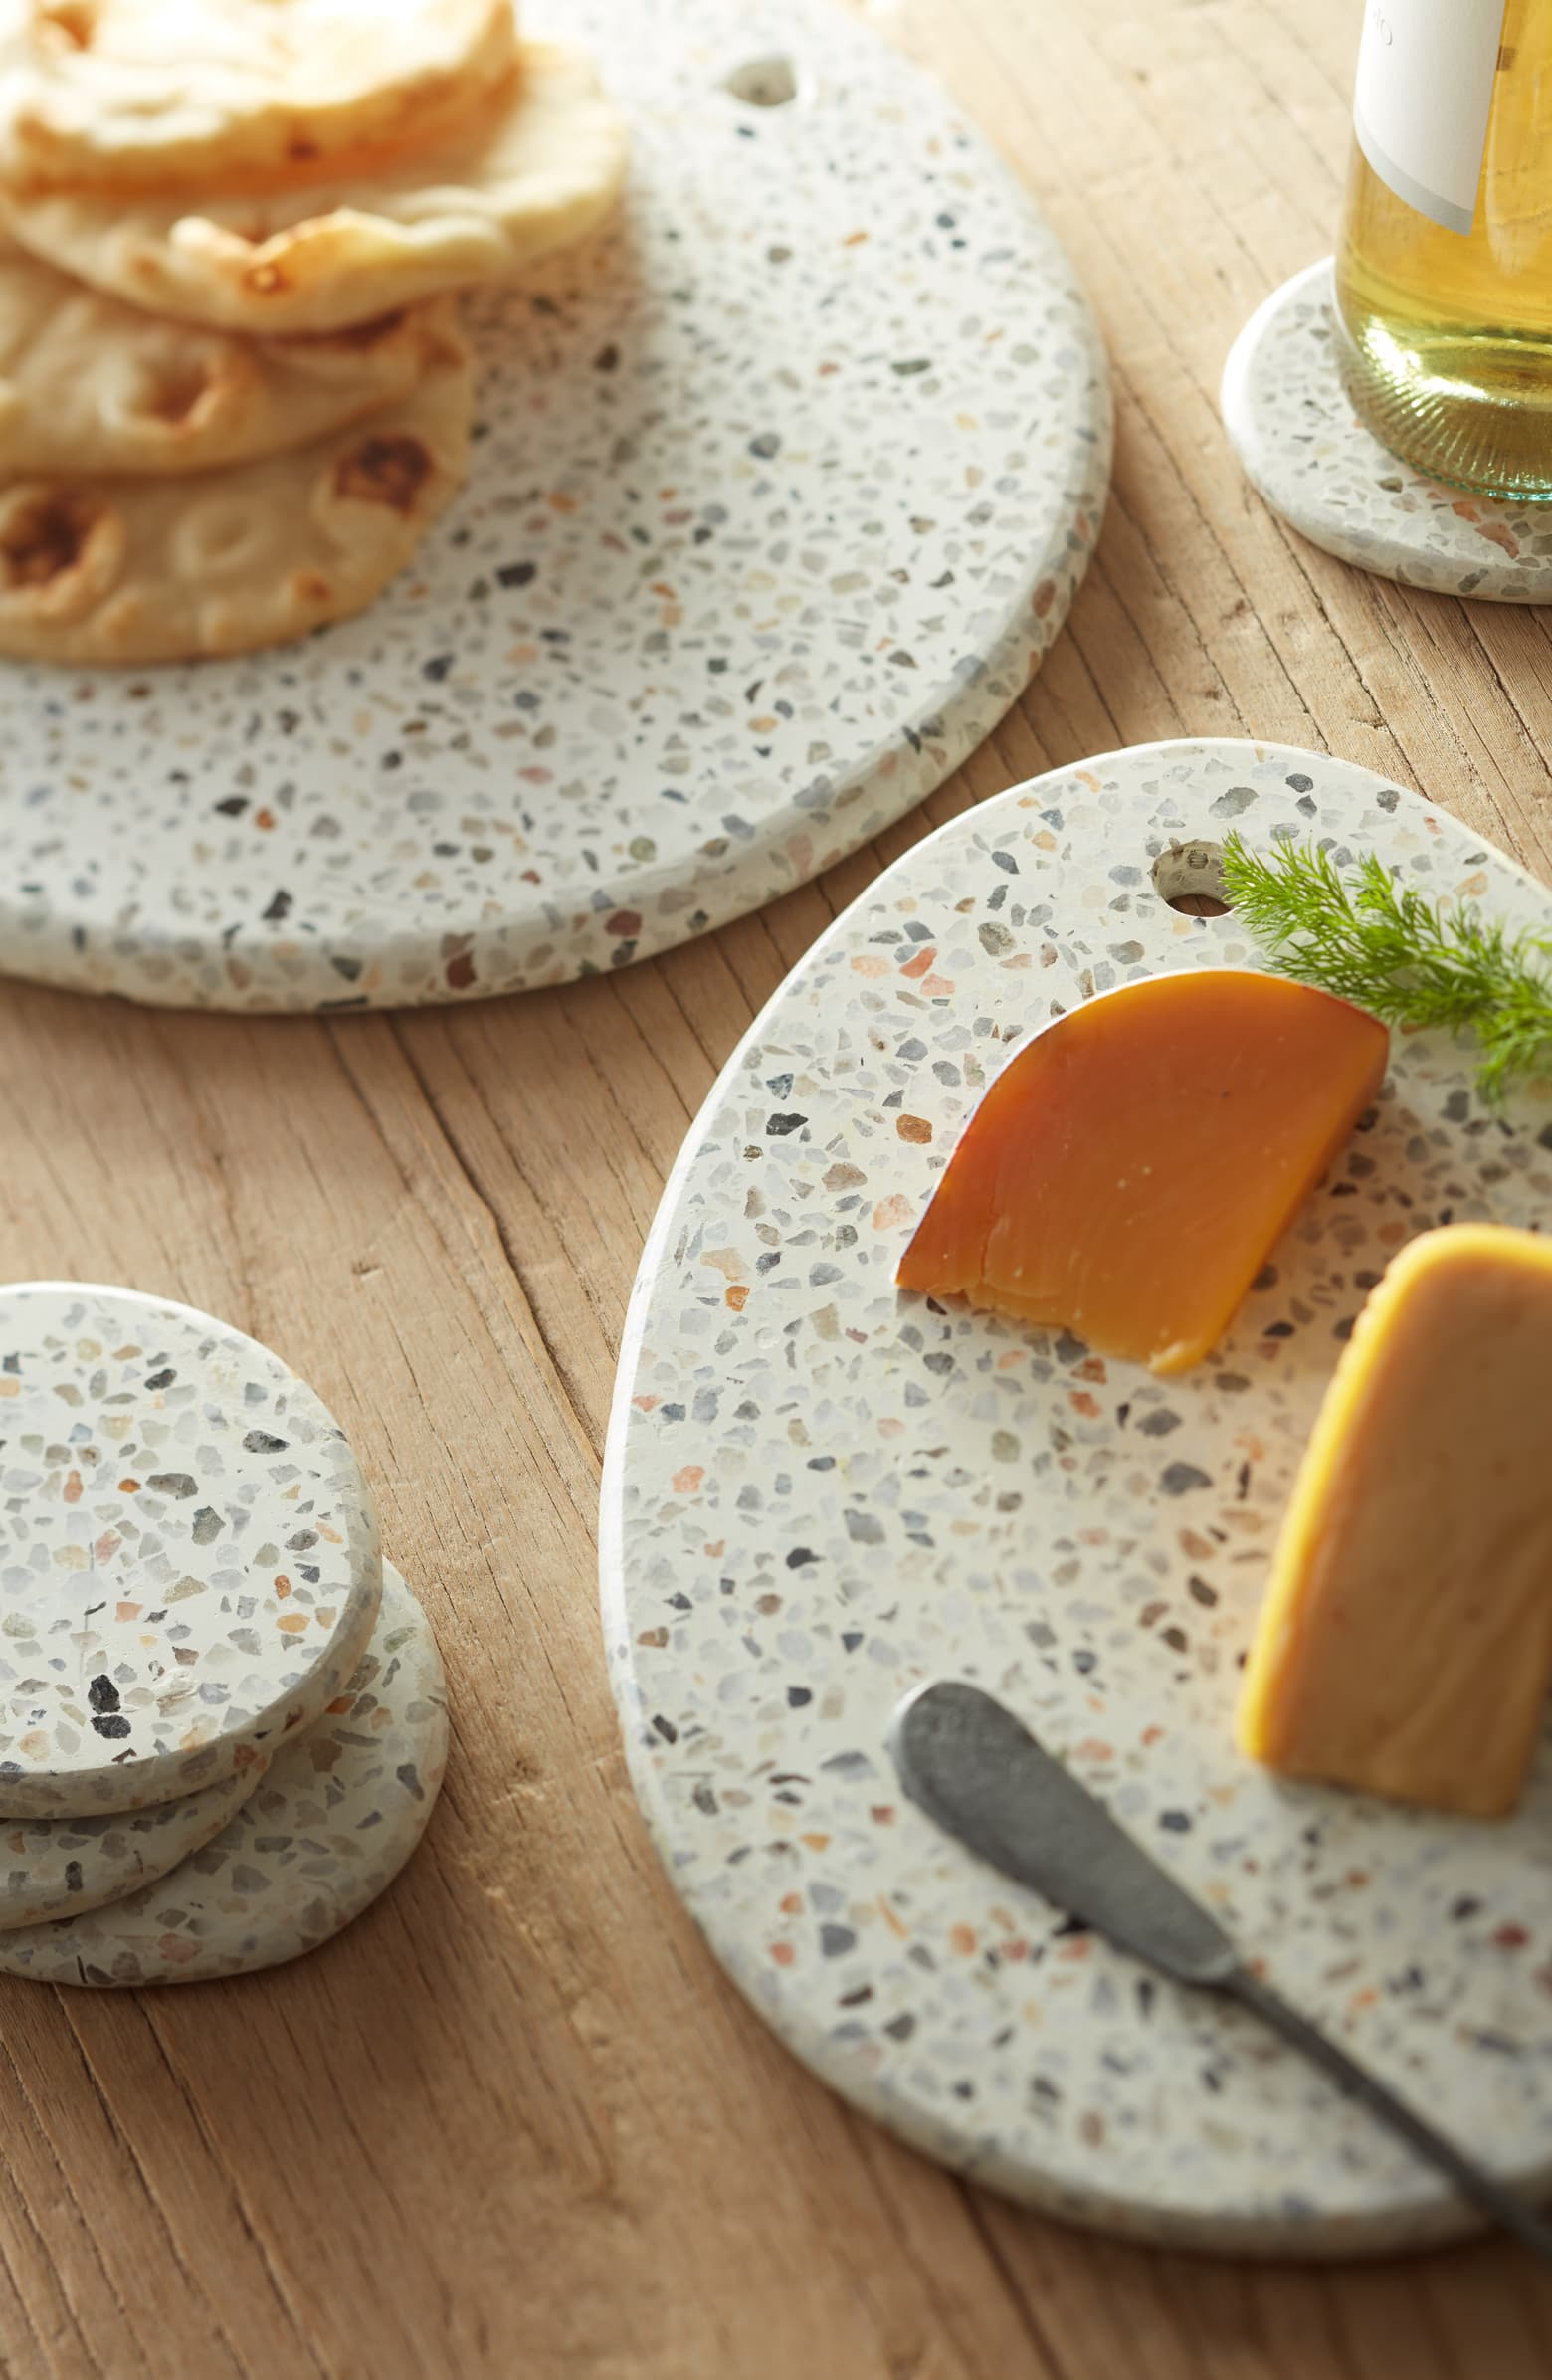 Terrazzo serving pieces